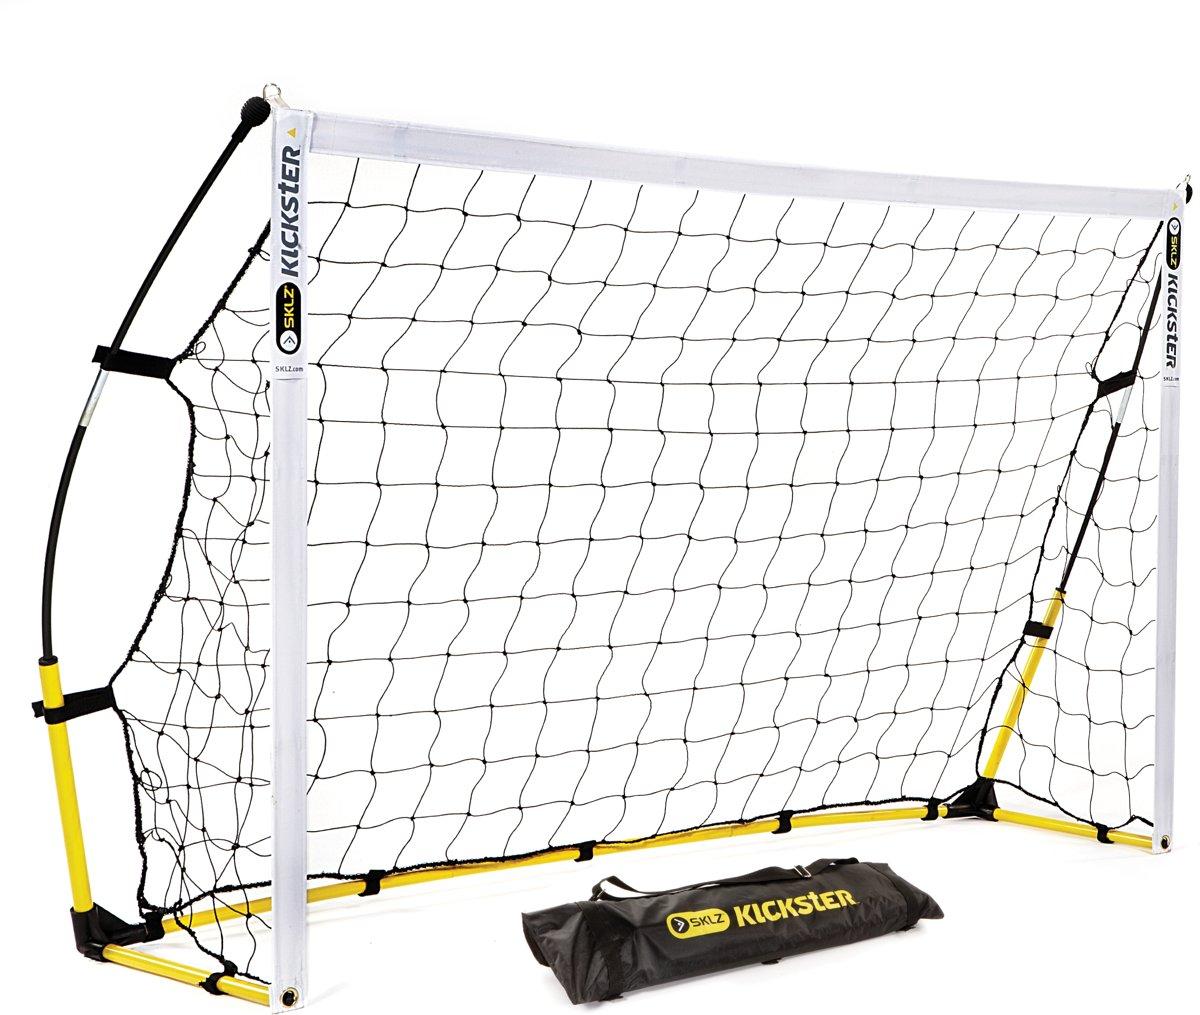 SKLZ Kickster Heavy - Voetbaldoel - 183 x 122 cm